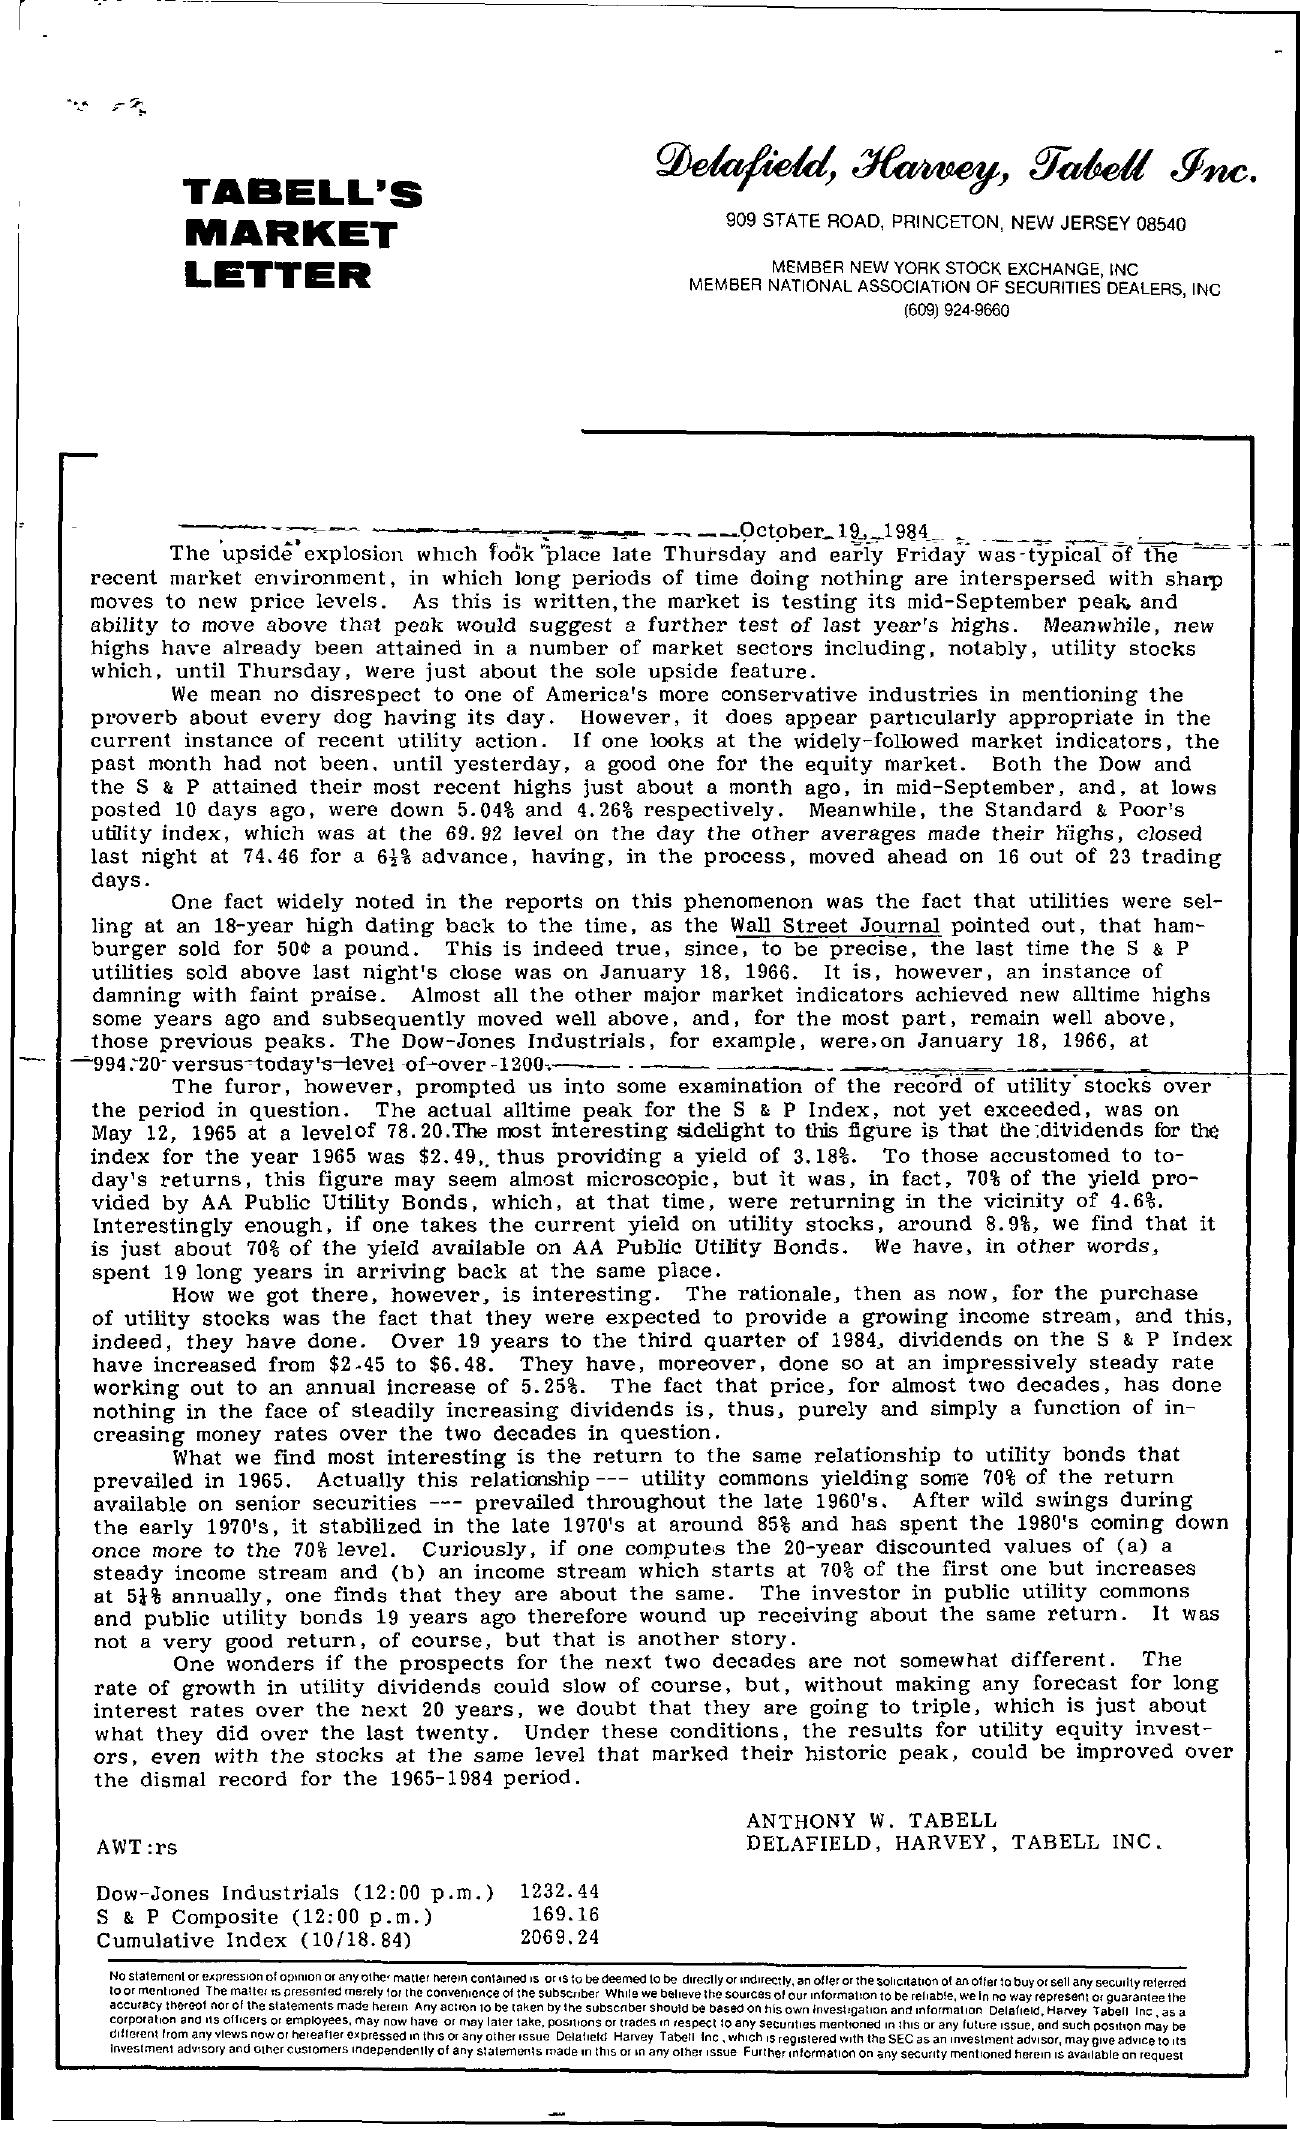 Tabell's Market Letter - October 19, 1984